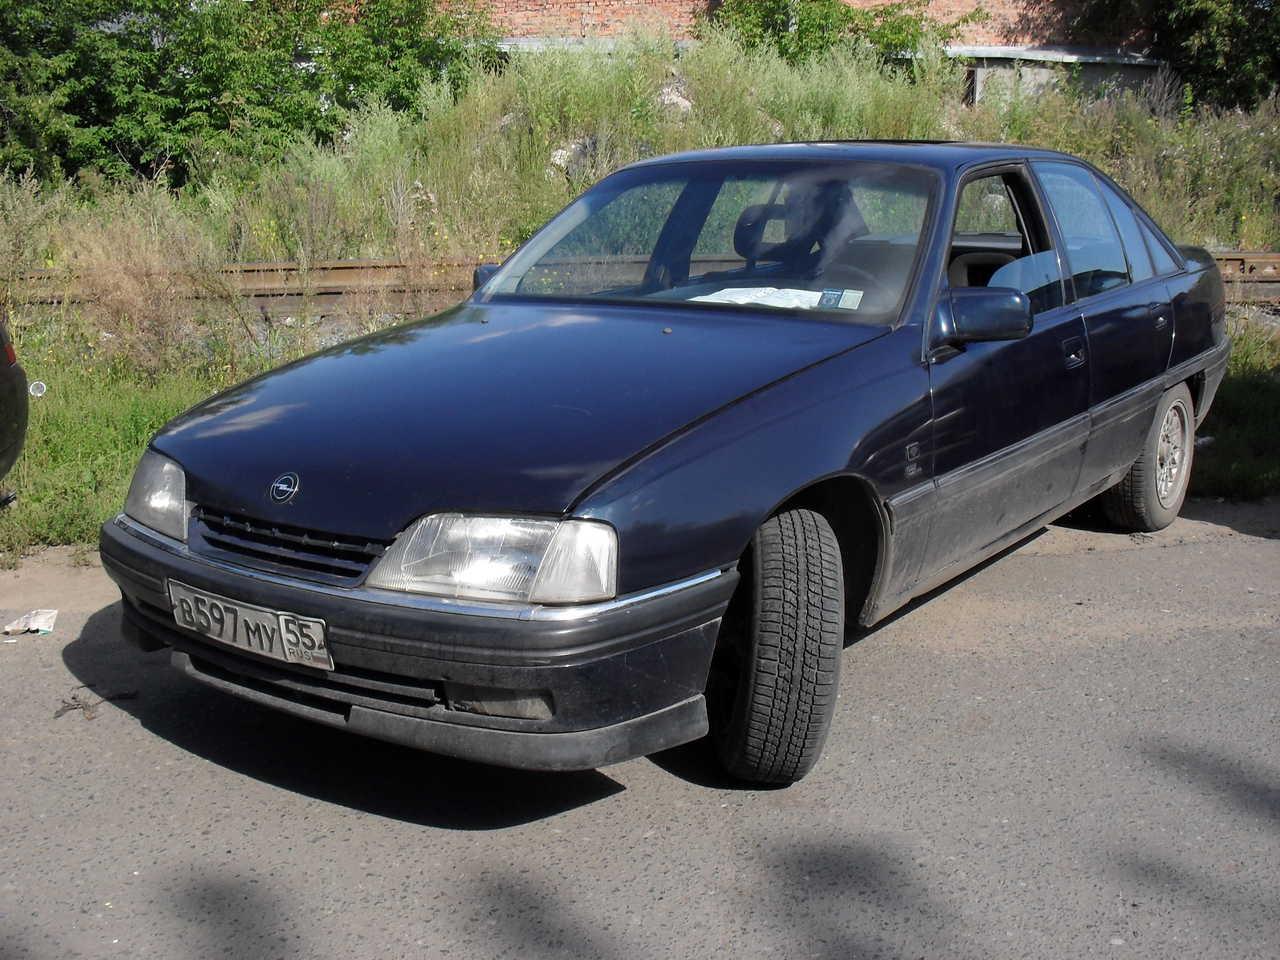 Opel Omega A B Orig on 1994 Acura Legend